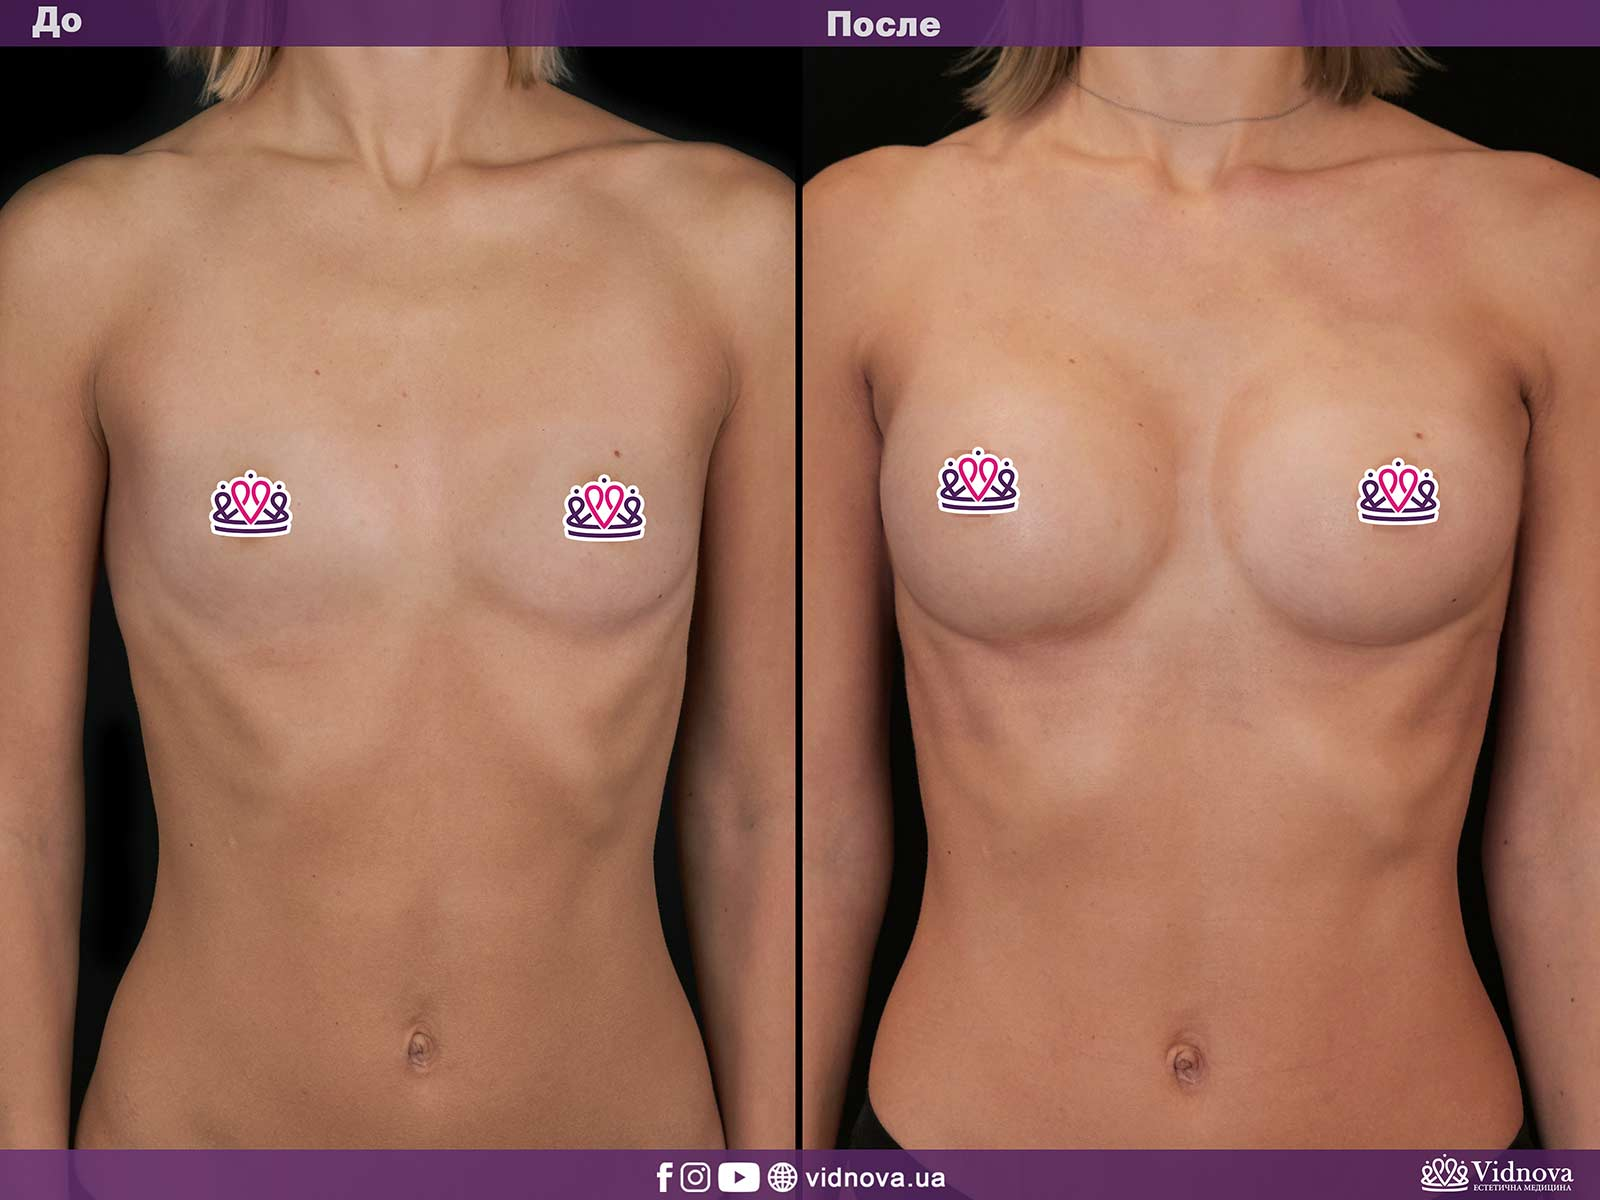 Увеличение груди: Фото ДО и ПОСЛЕ - Пример №7-1 - Клиника Vidnova